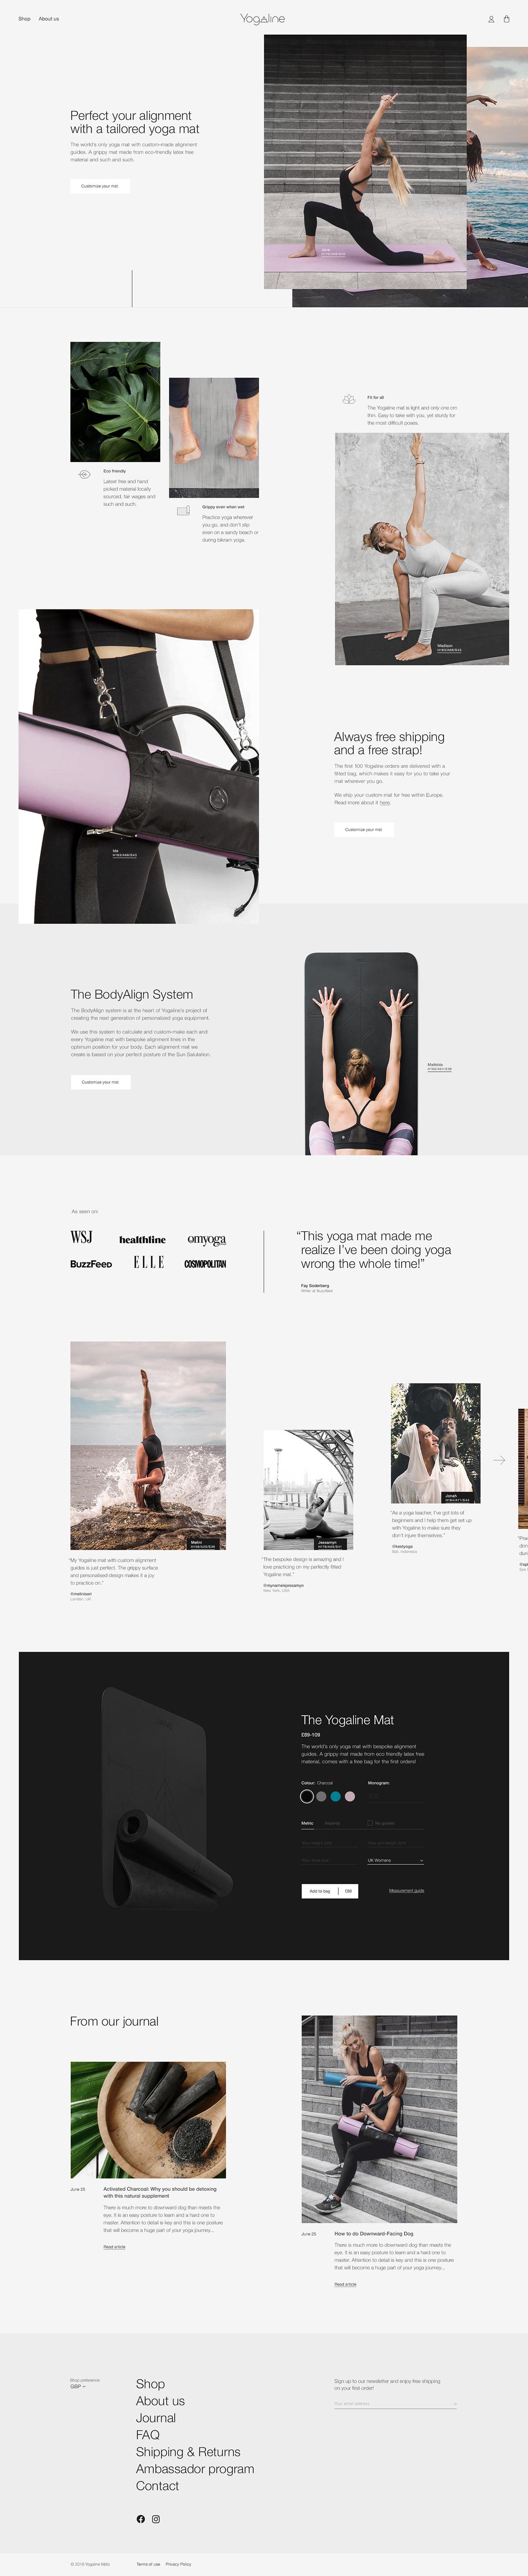 Custom DTC Ecommerce FAQ fitness grid helvetica journal shop Yoga